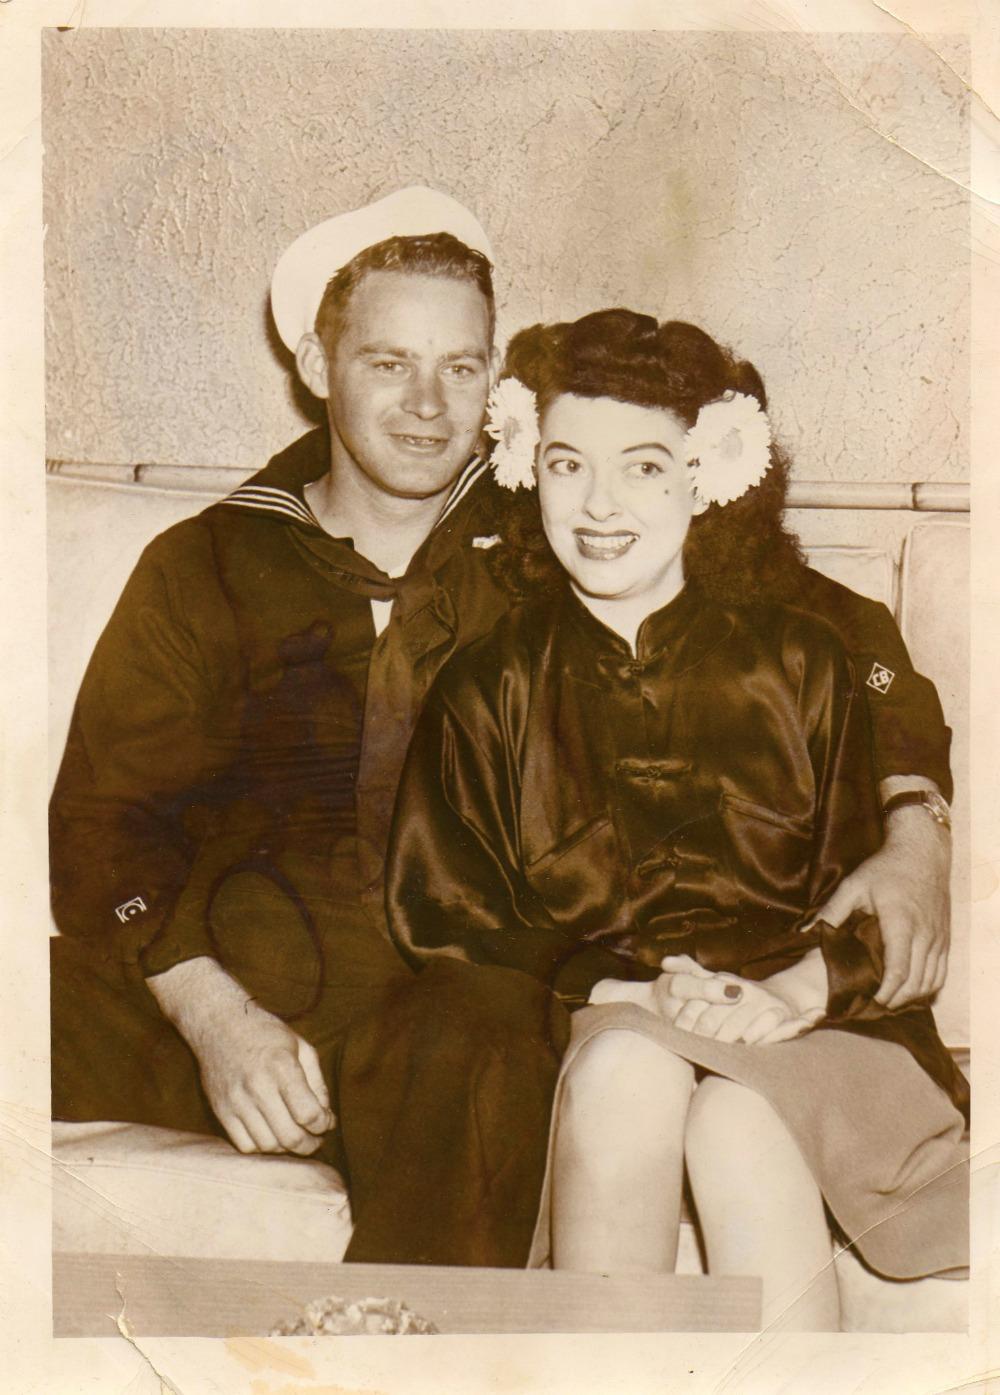 James Paul Stalls, Jr at the Li Po Lounge, Chinatown, San Francisco, California 1944